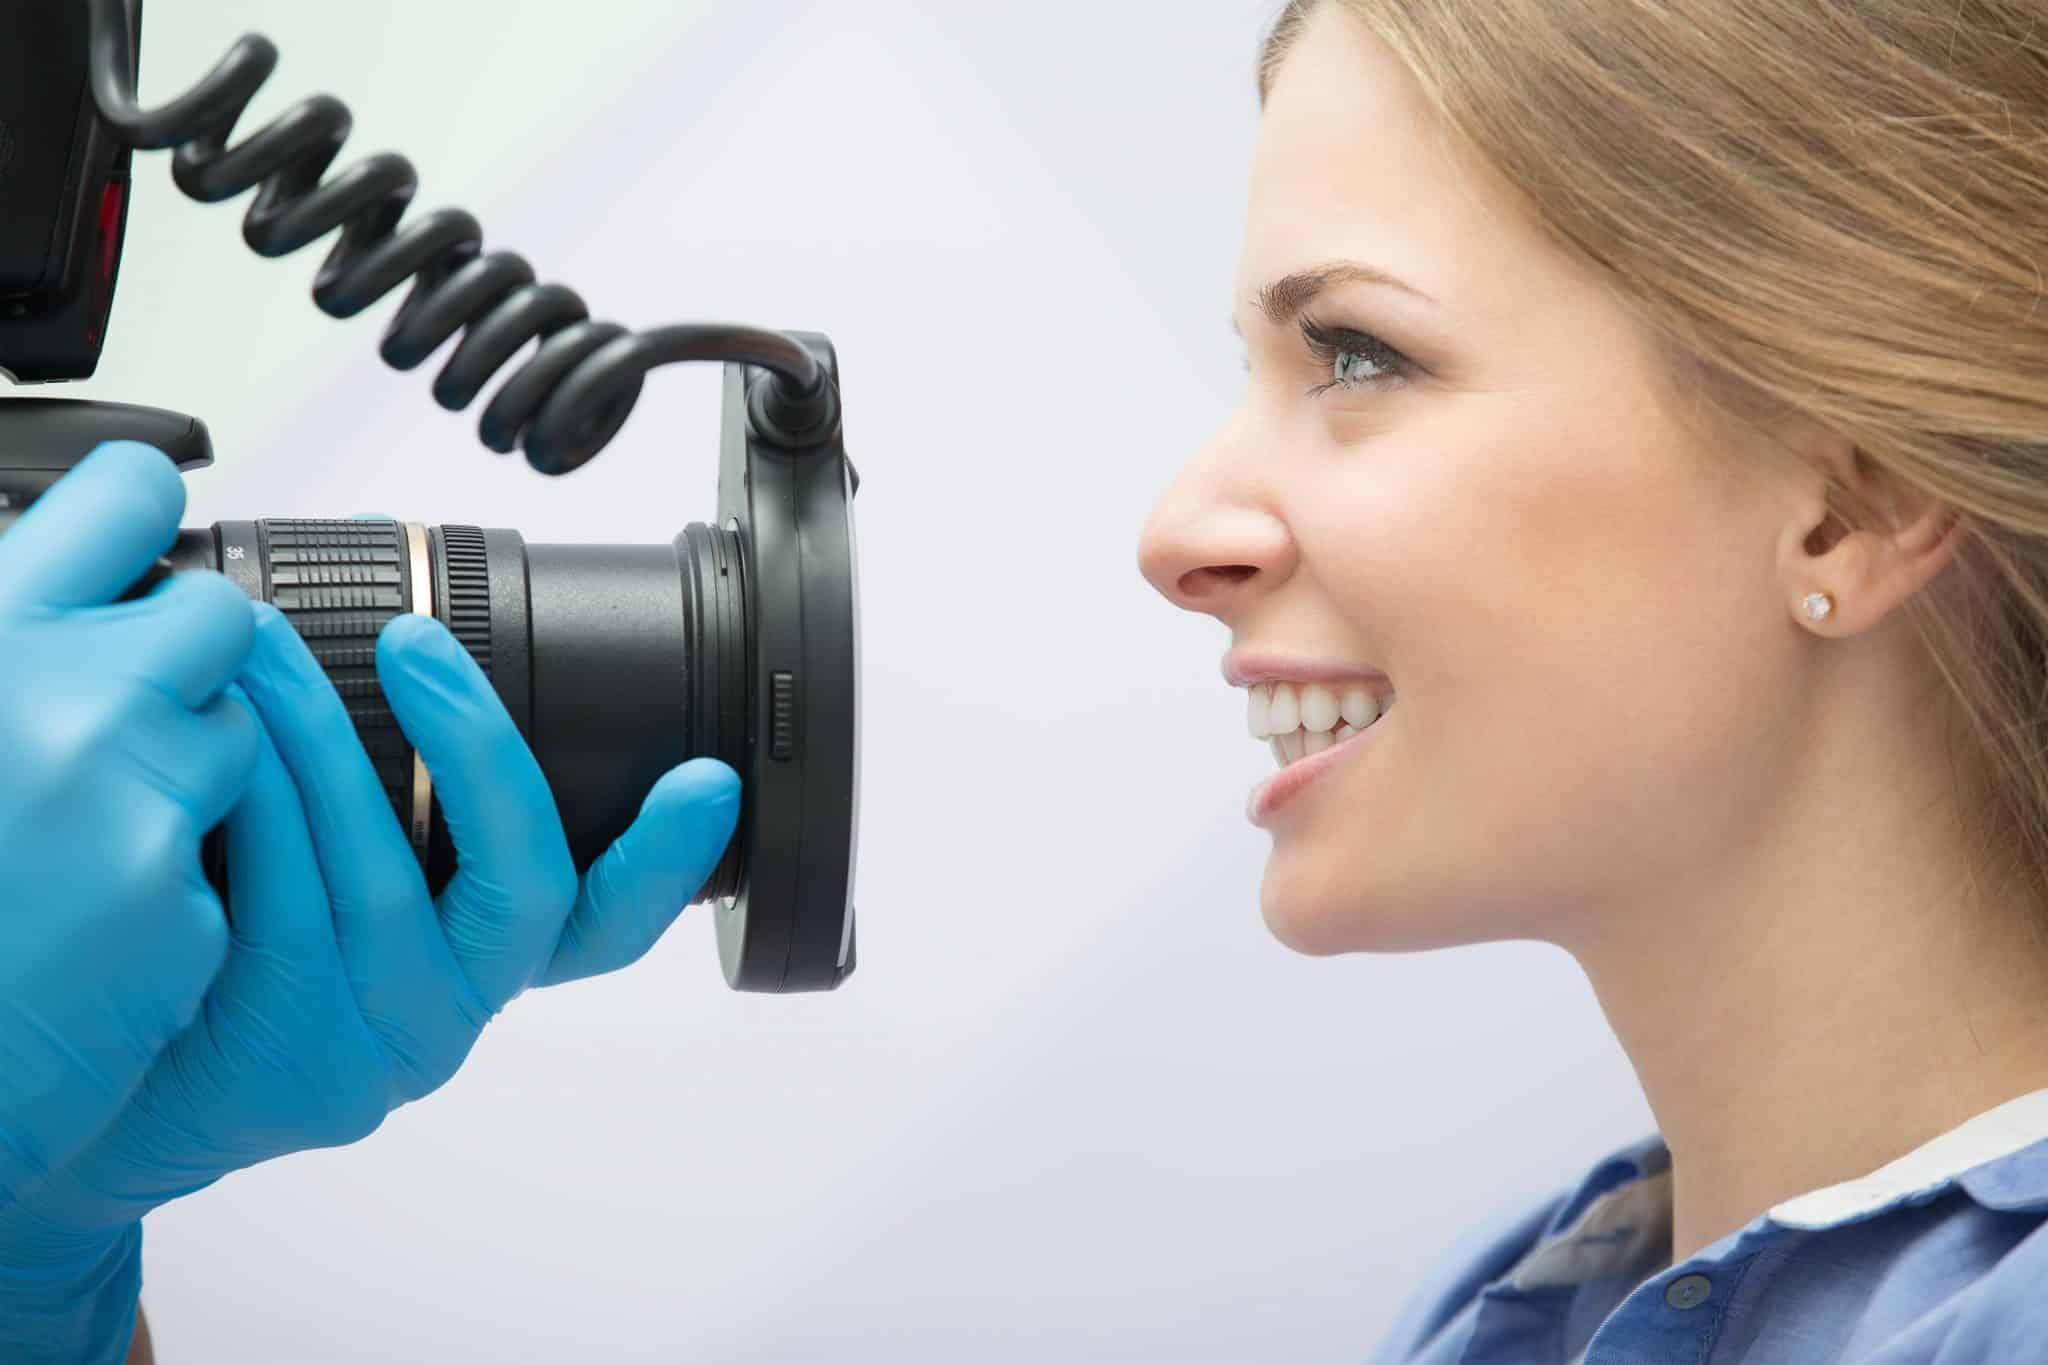 photographing-teeth